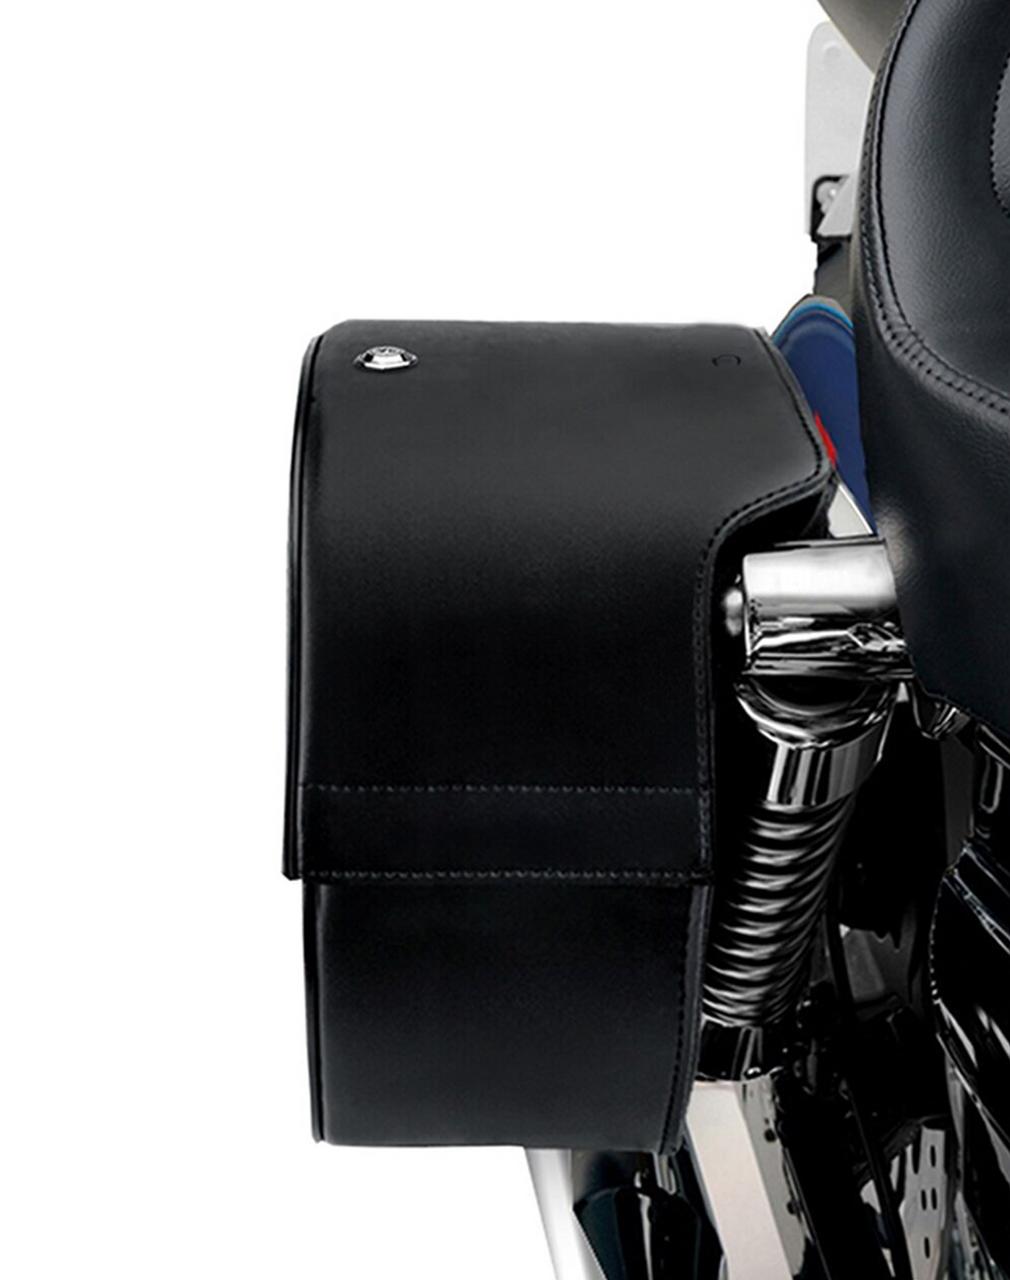 Viking Single Strap Shock Cut Slant Large Motorcycle Saddlebags For Harley Dyna Street Bob FXDB Shock Cutout View